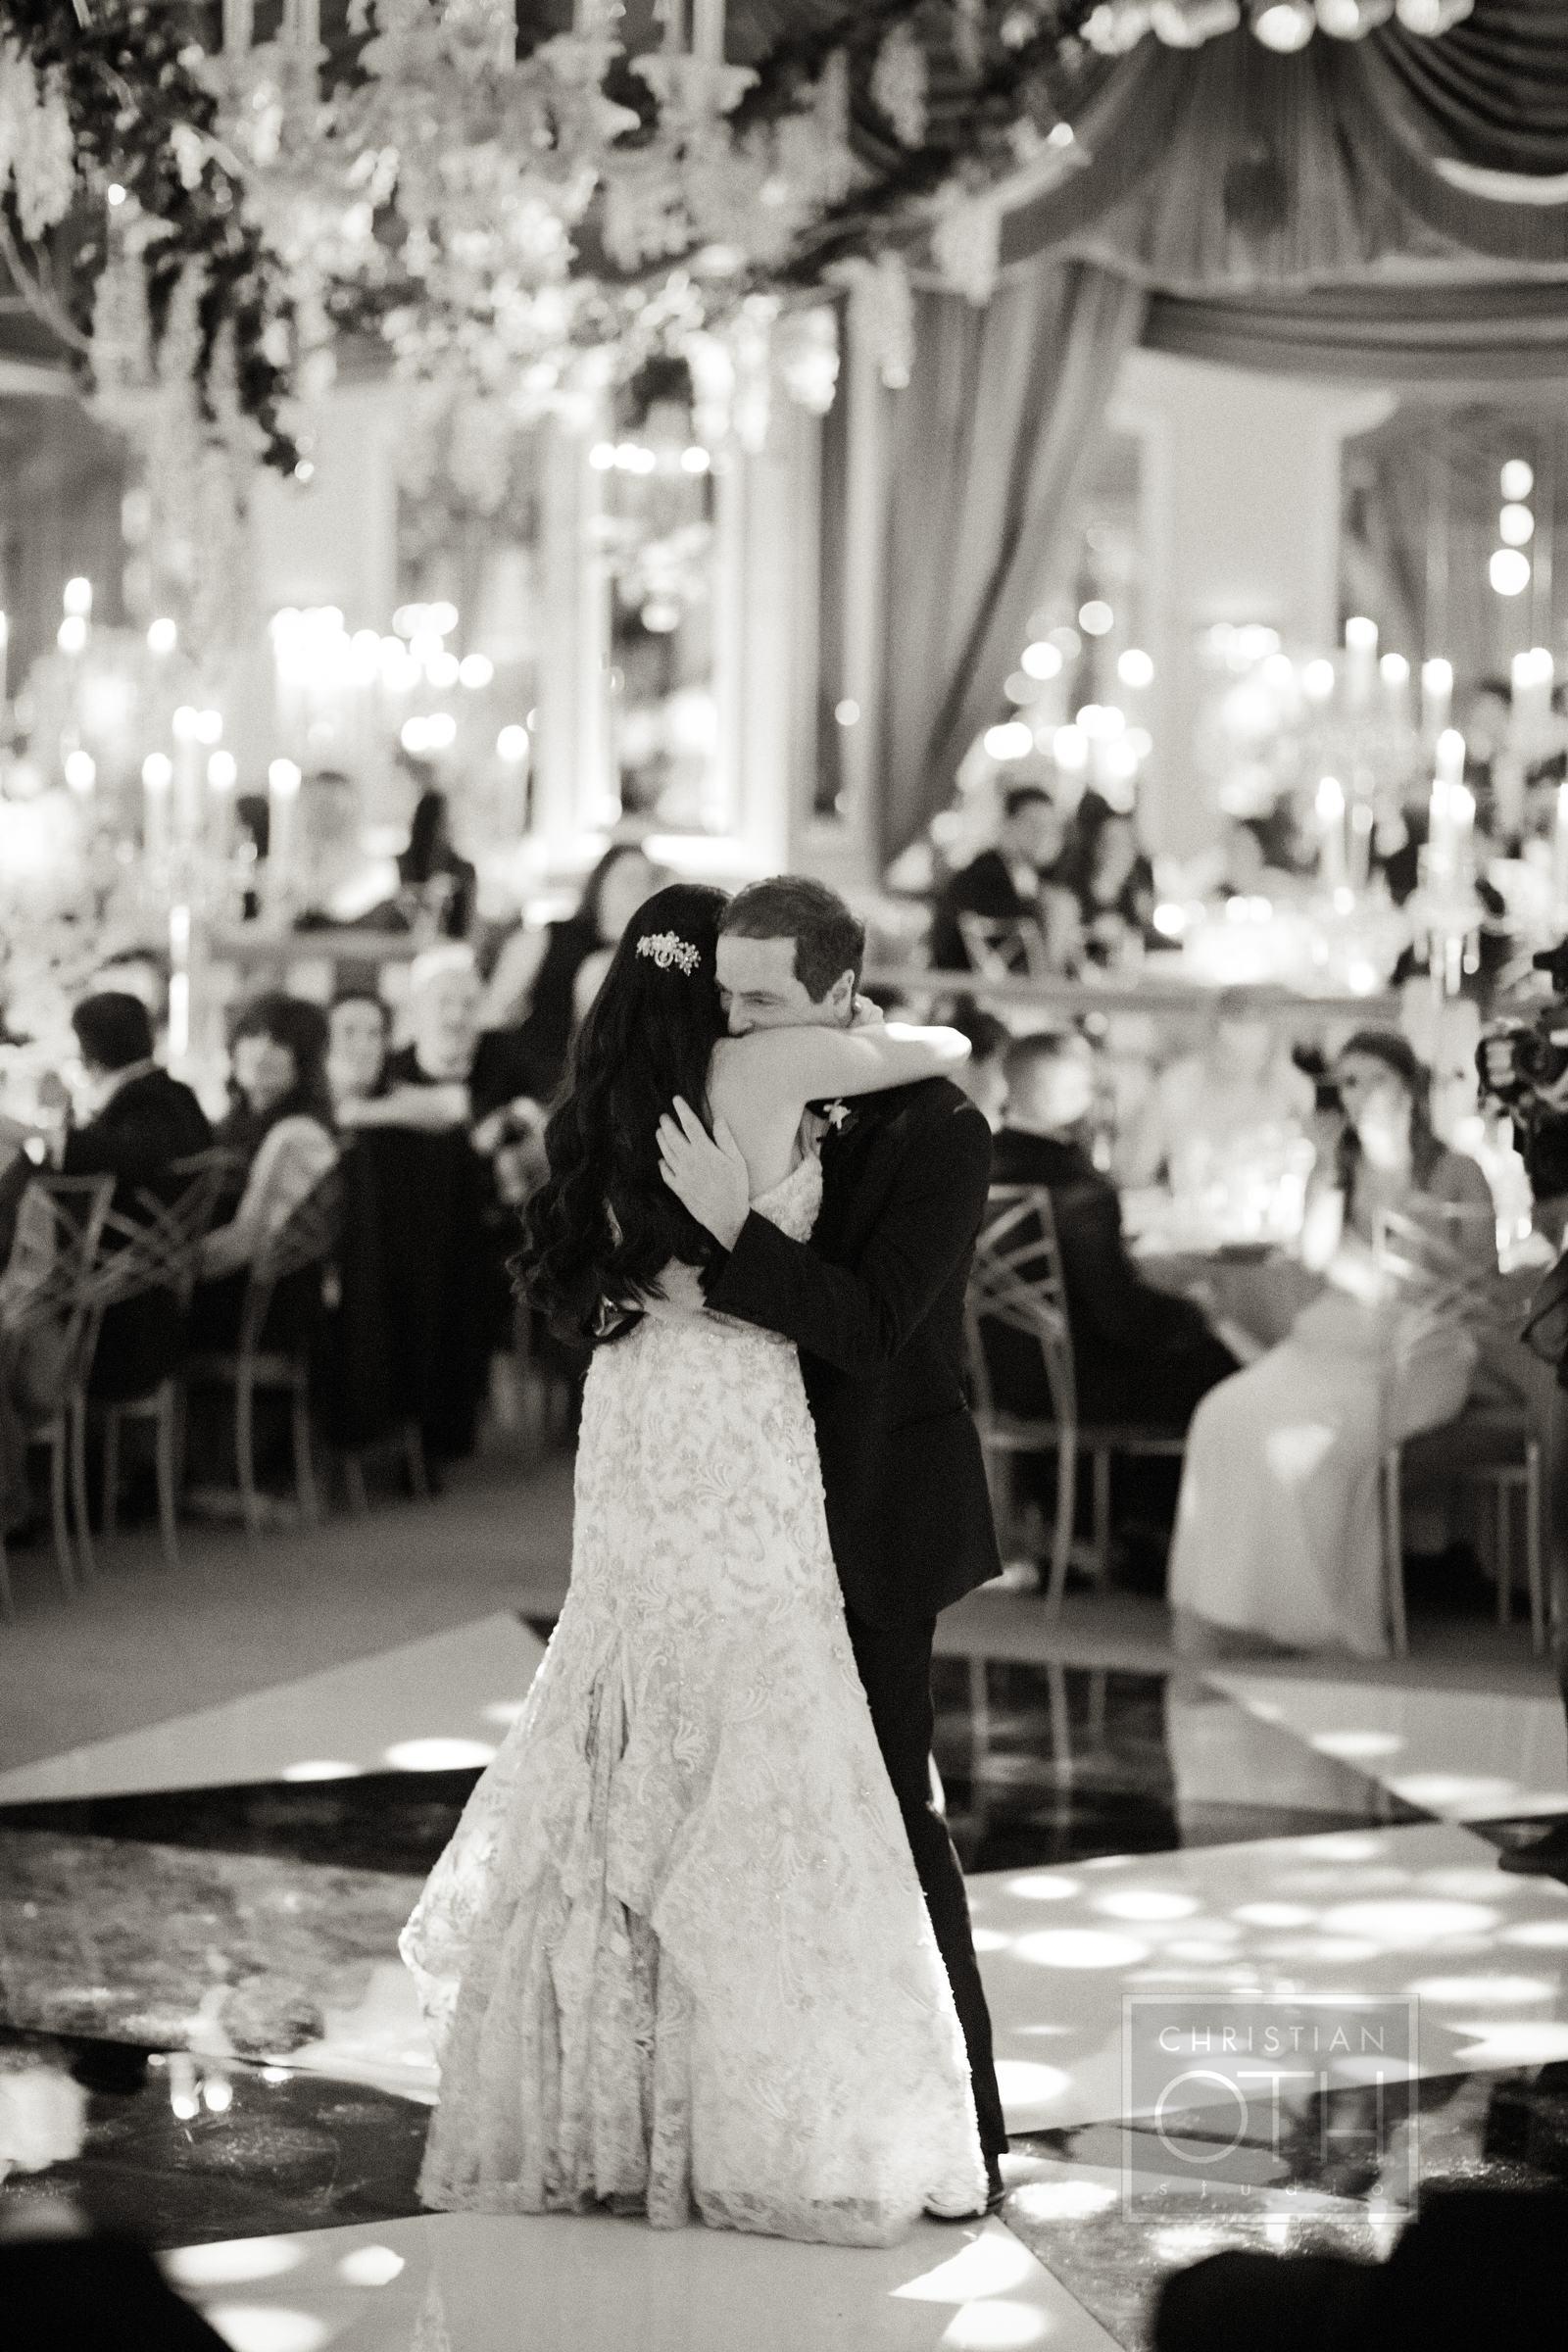 Ceci_New_York_Custom_Invitation_Pierre__City_ Destination_Wedding_Luxury_Personalized_Ceci_Style_Bride_Rose_Gold_Foil_Stamping152.JPG